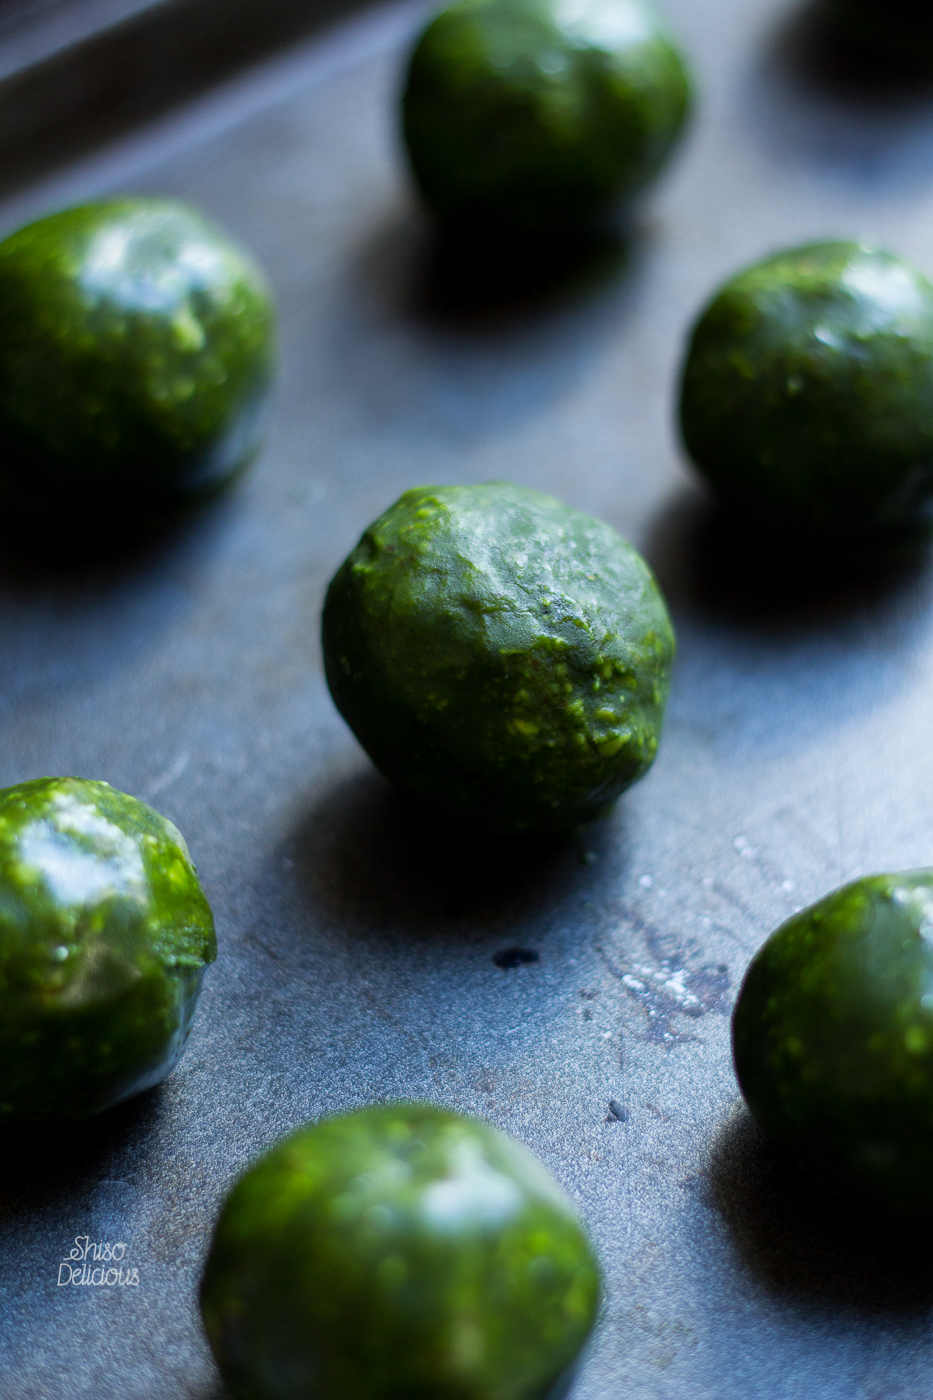 Shiso Delicious | Matcha Pearls